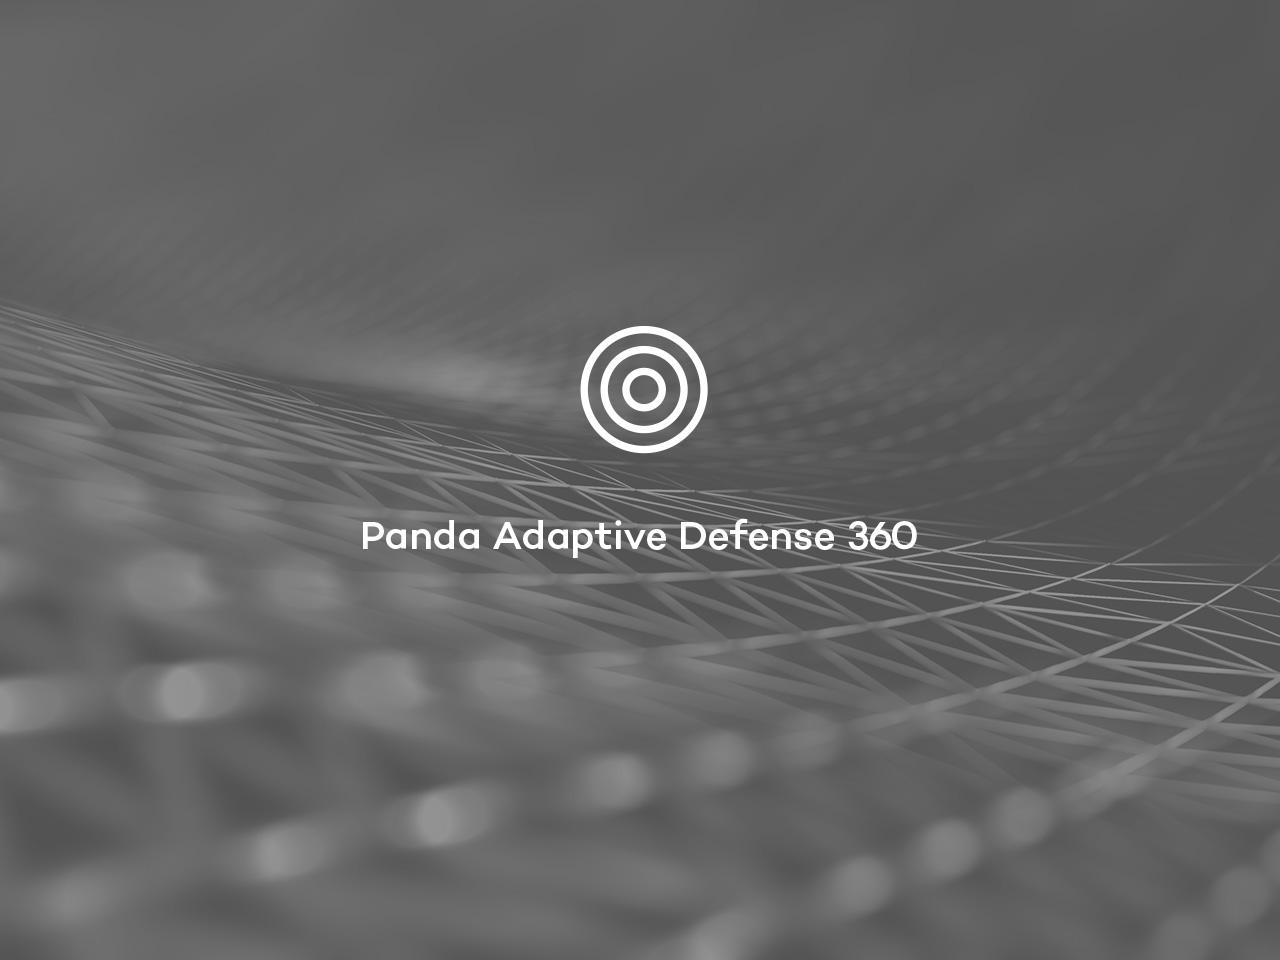 Adaptive Defence 360